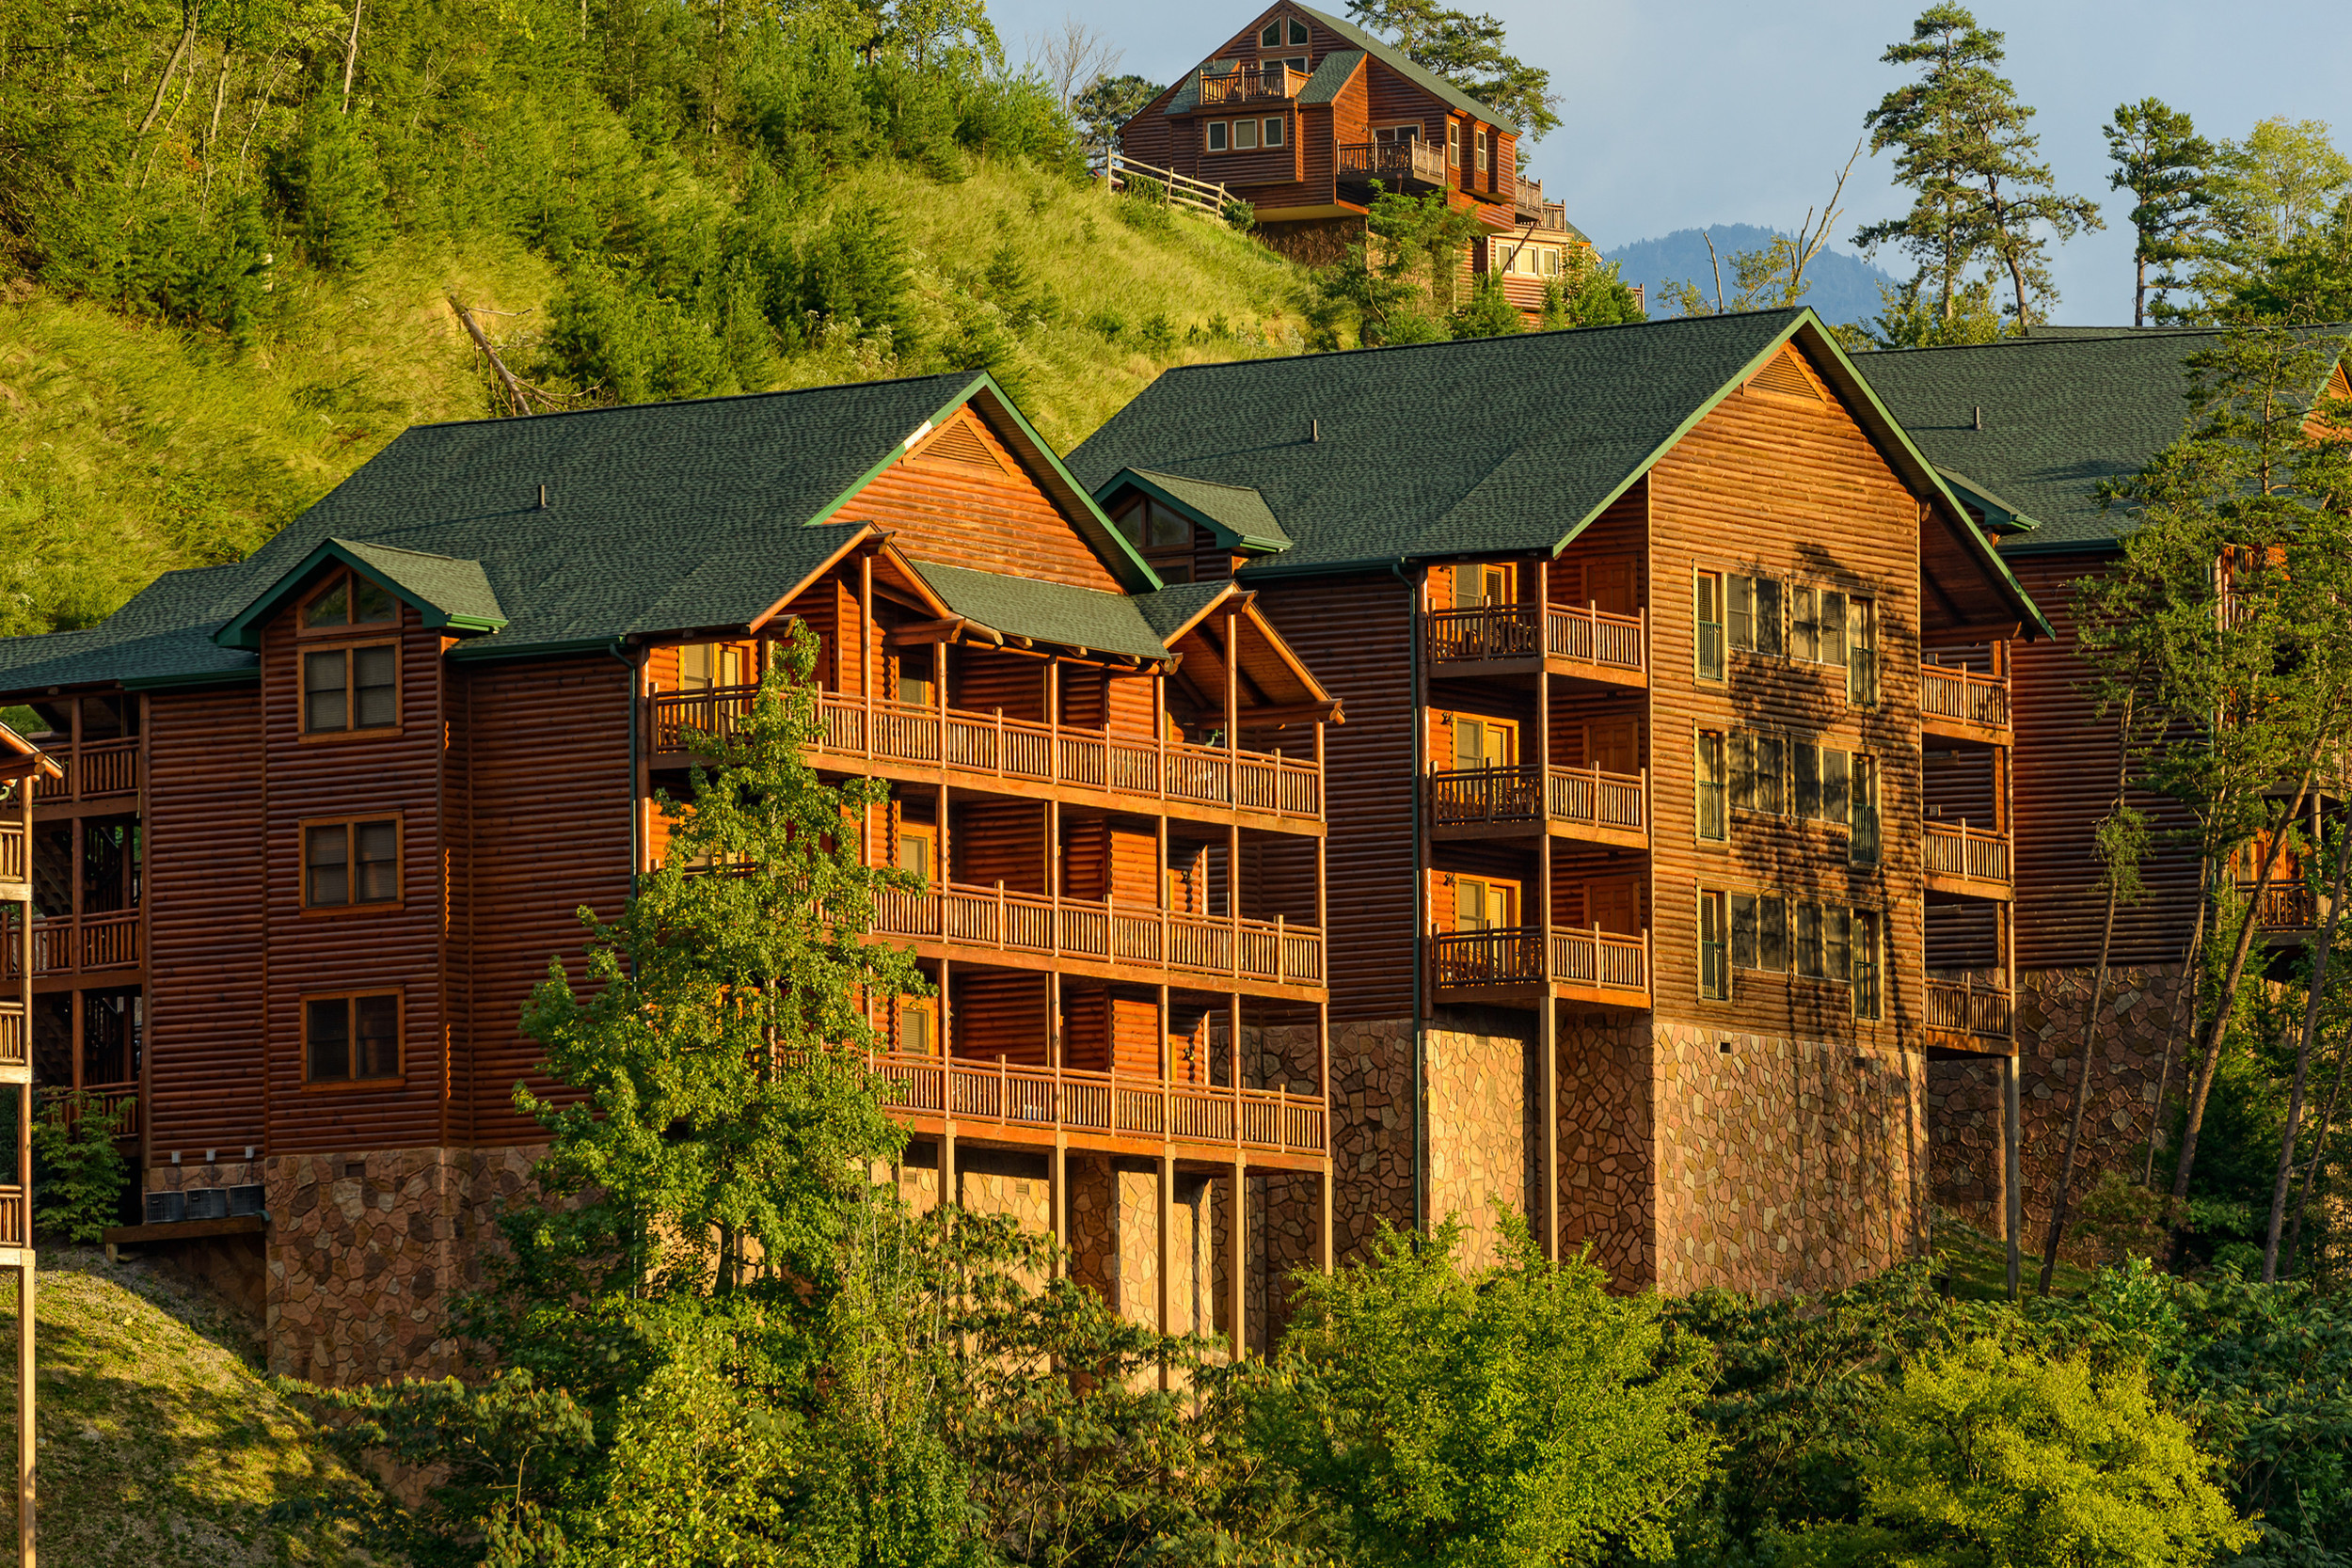 Resort building nestled within Smokies | Westgate Smoky Mountain Resort & Spa